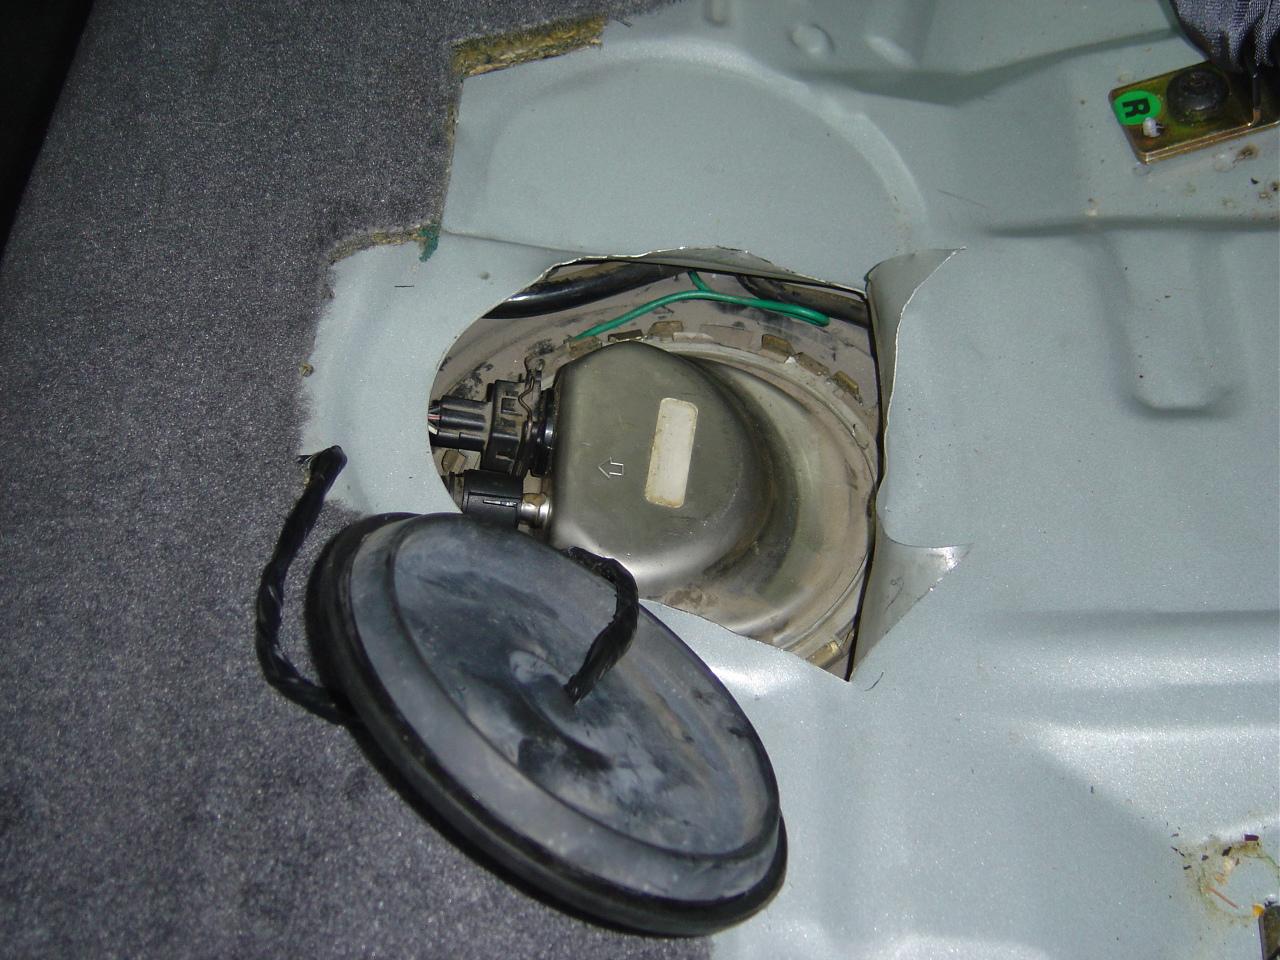 2006 Ford F150 Fuel Pump Wiring Electrical Problem 2006 Ford F150